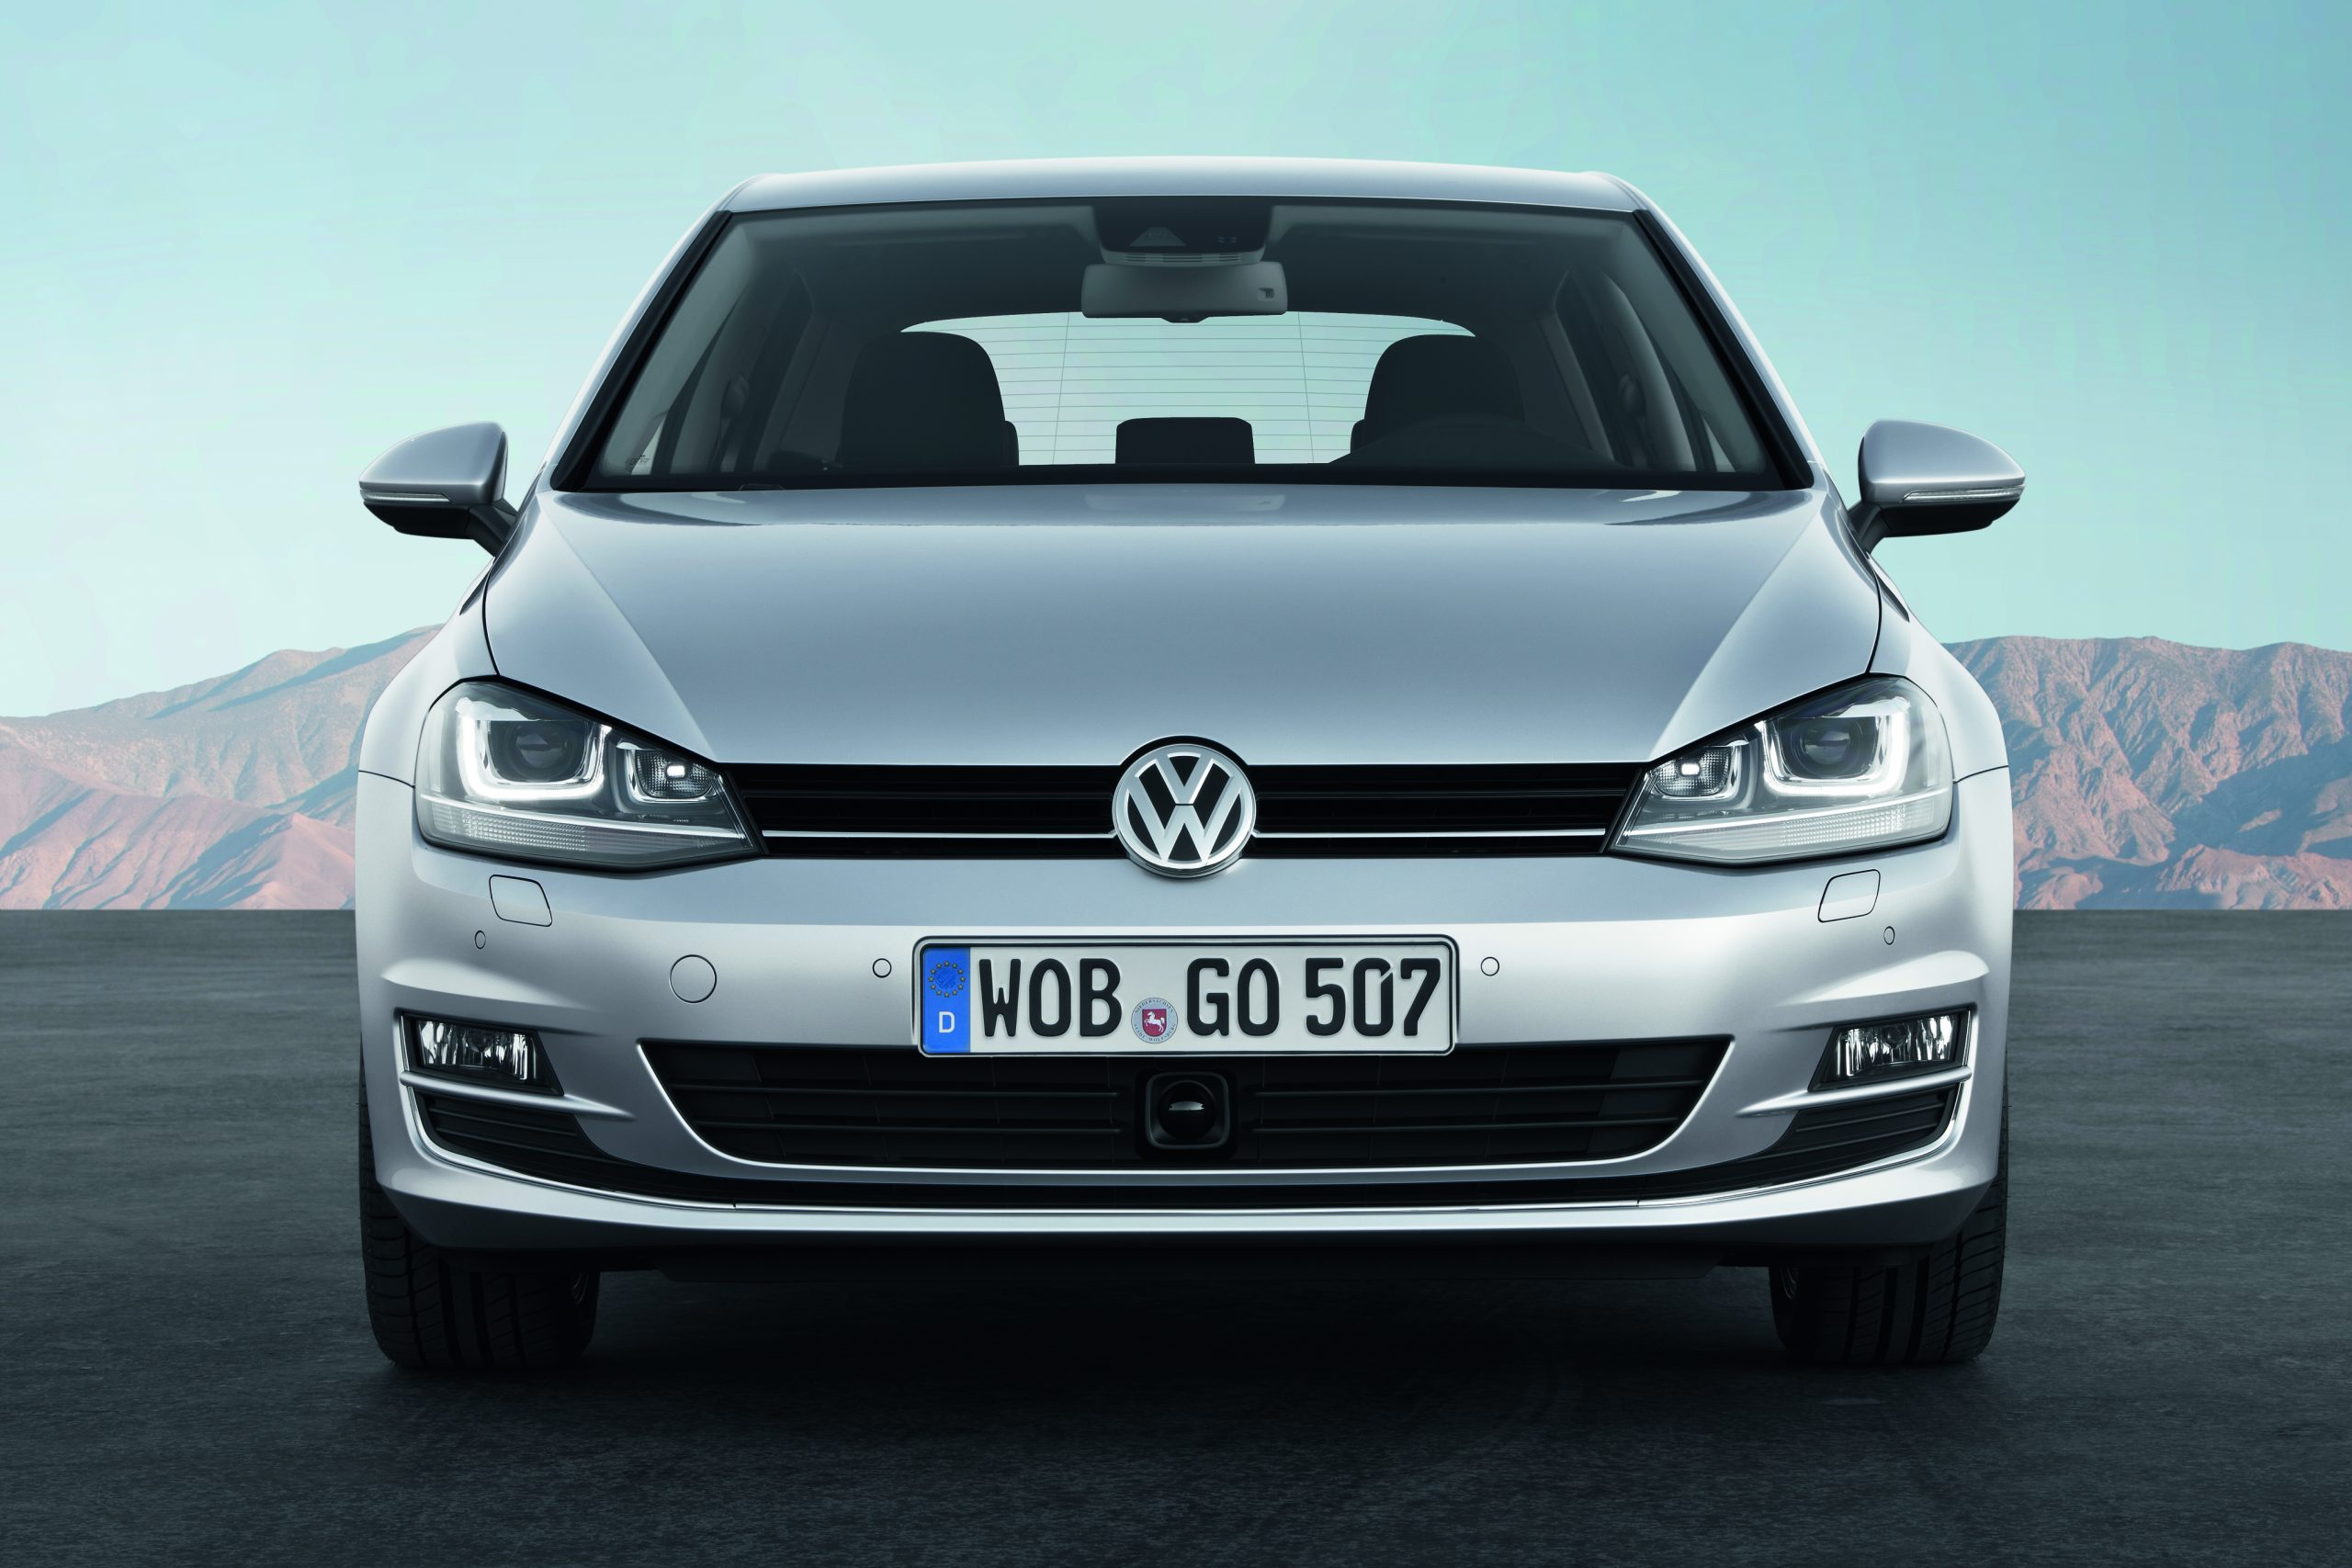 VW Golf mk7 front